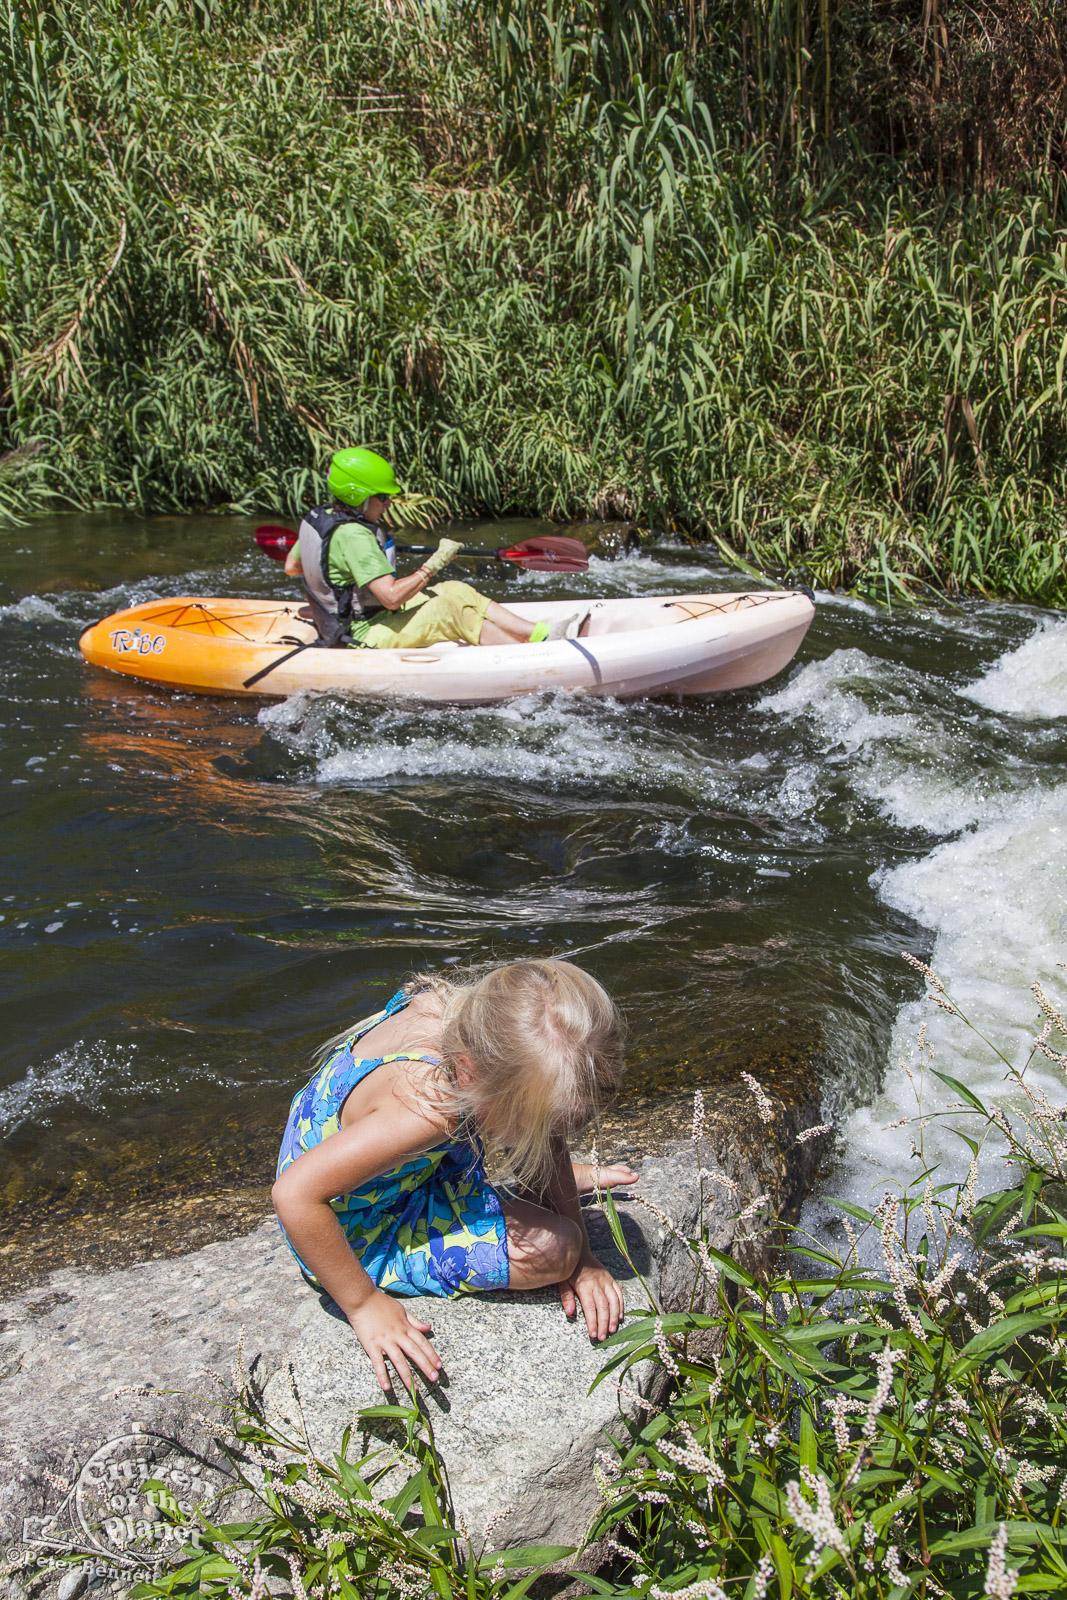 US_CA_48_3875_la_river_boat_race.jpg